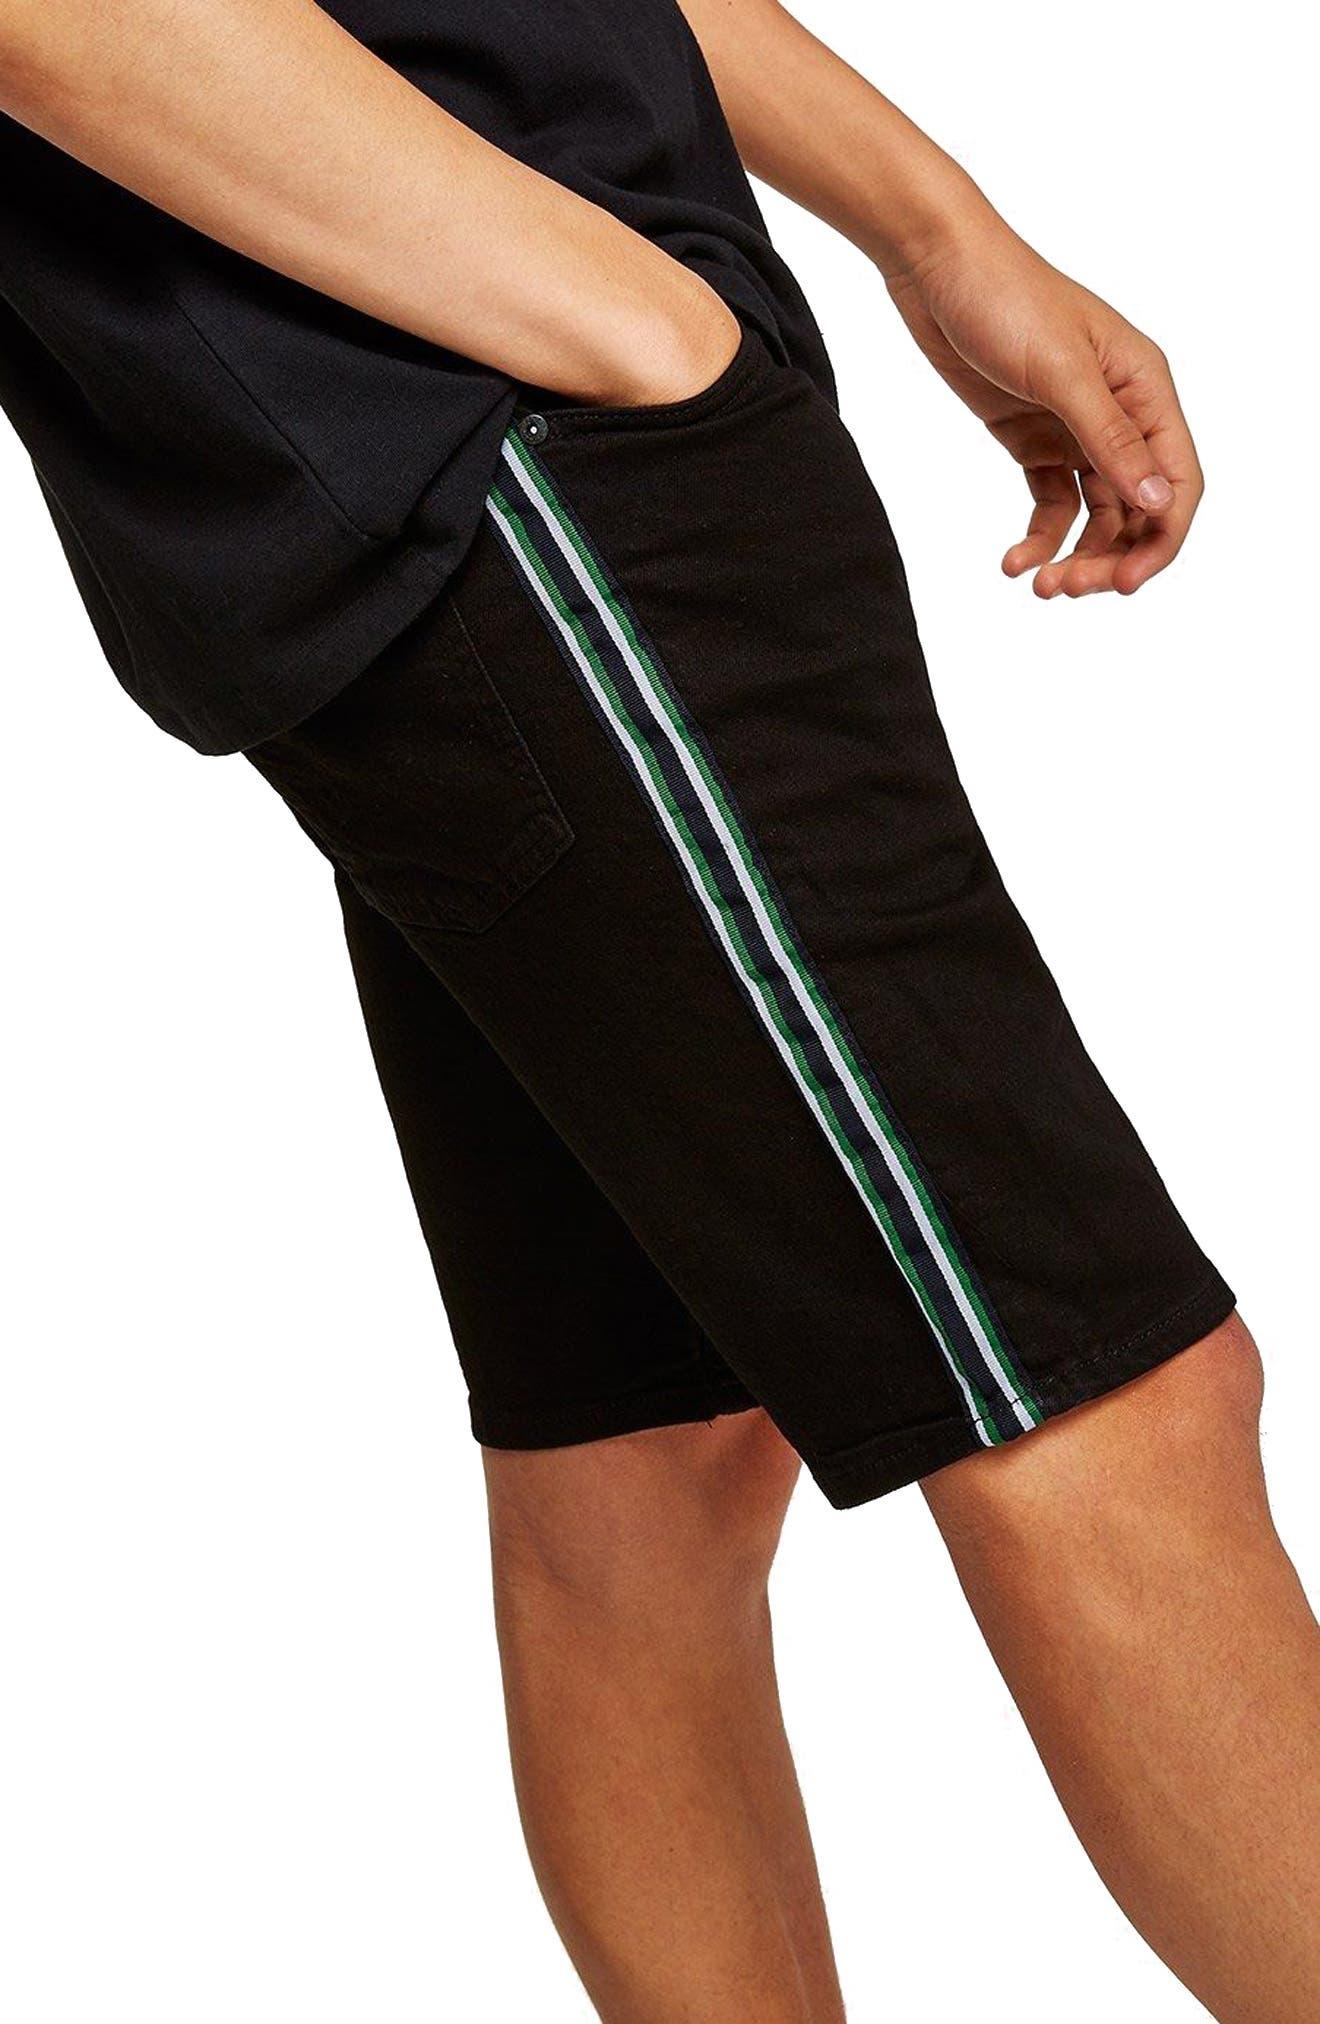 Tape Stretch Skinny Fit Denim Shorts,                             Alternate thumbnail 3, color,                             001